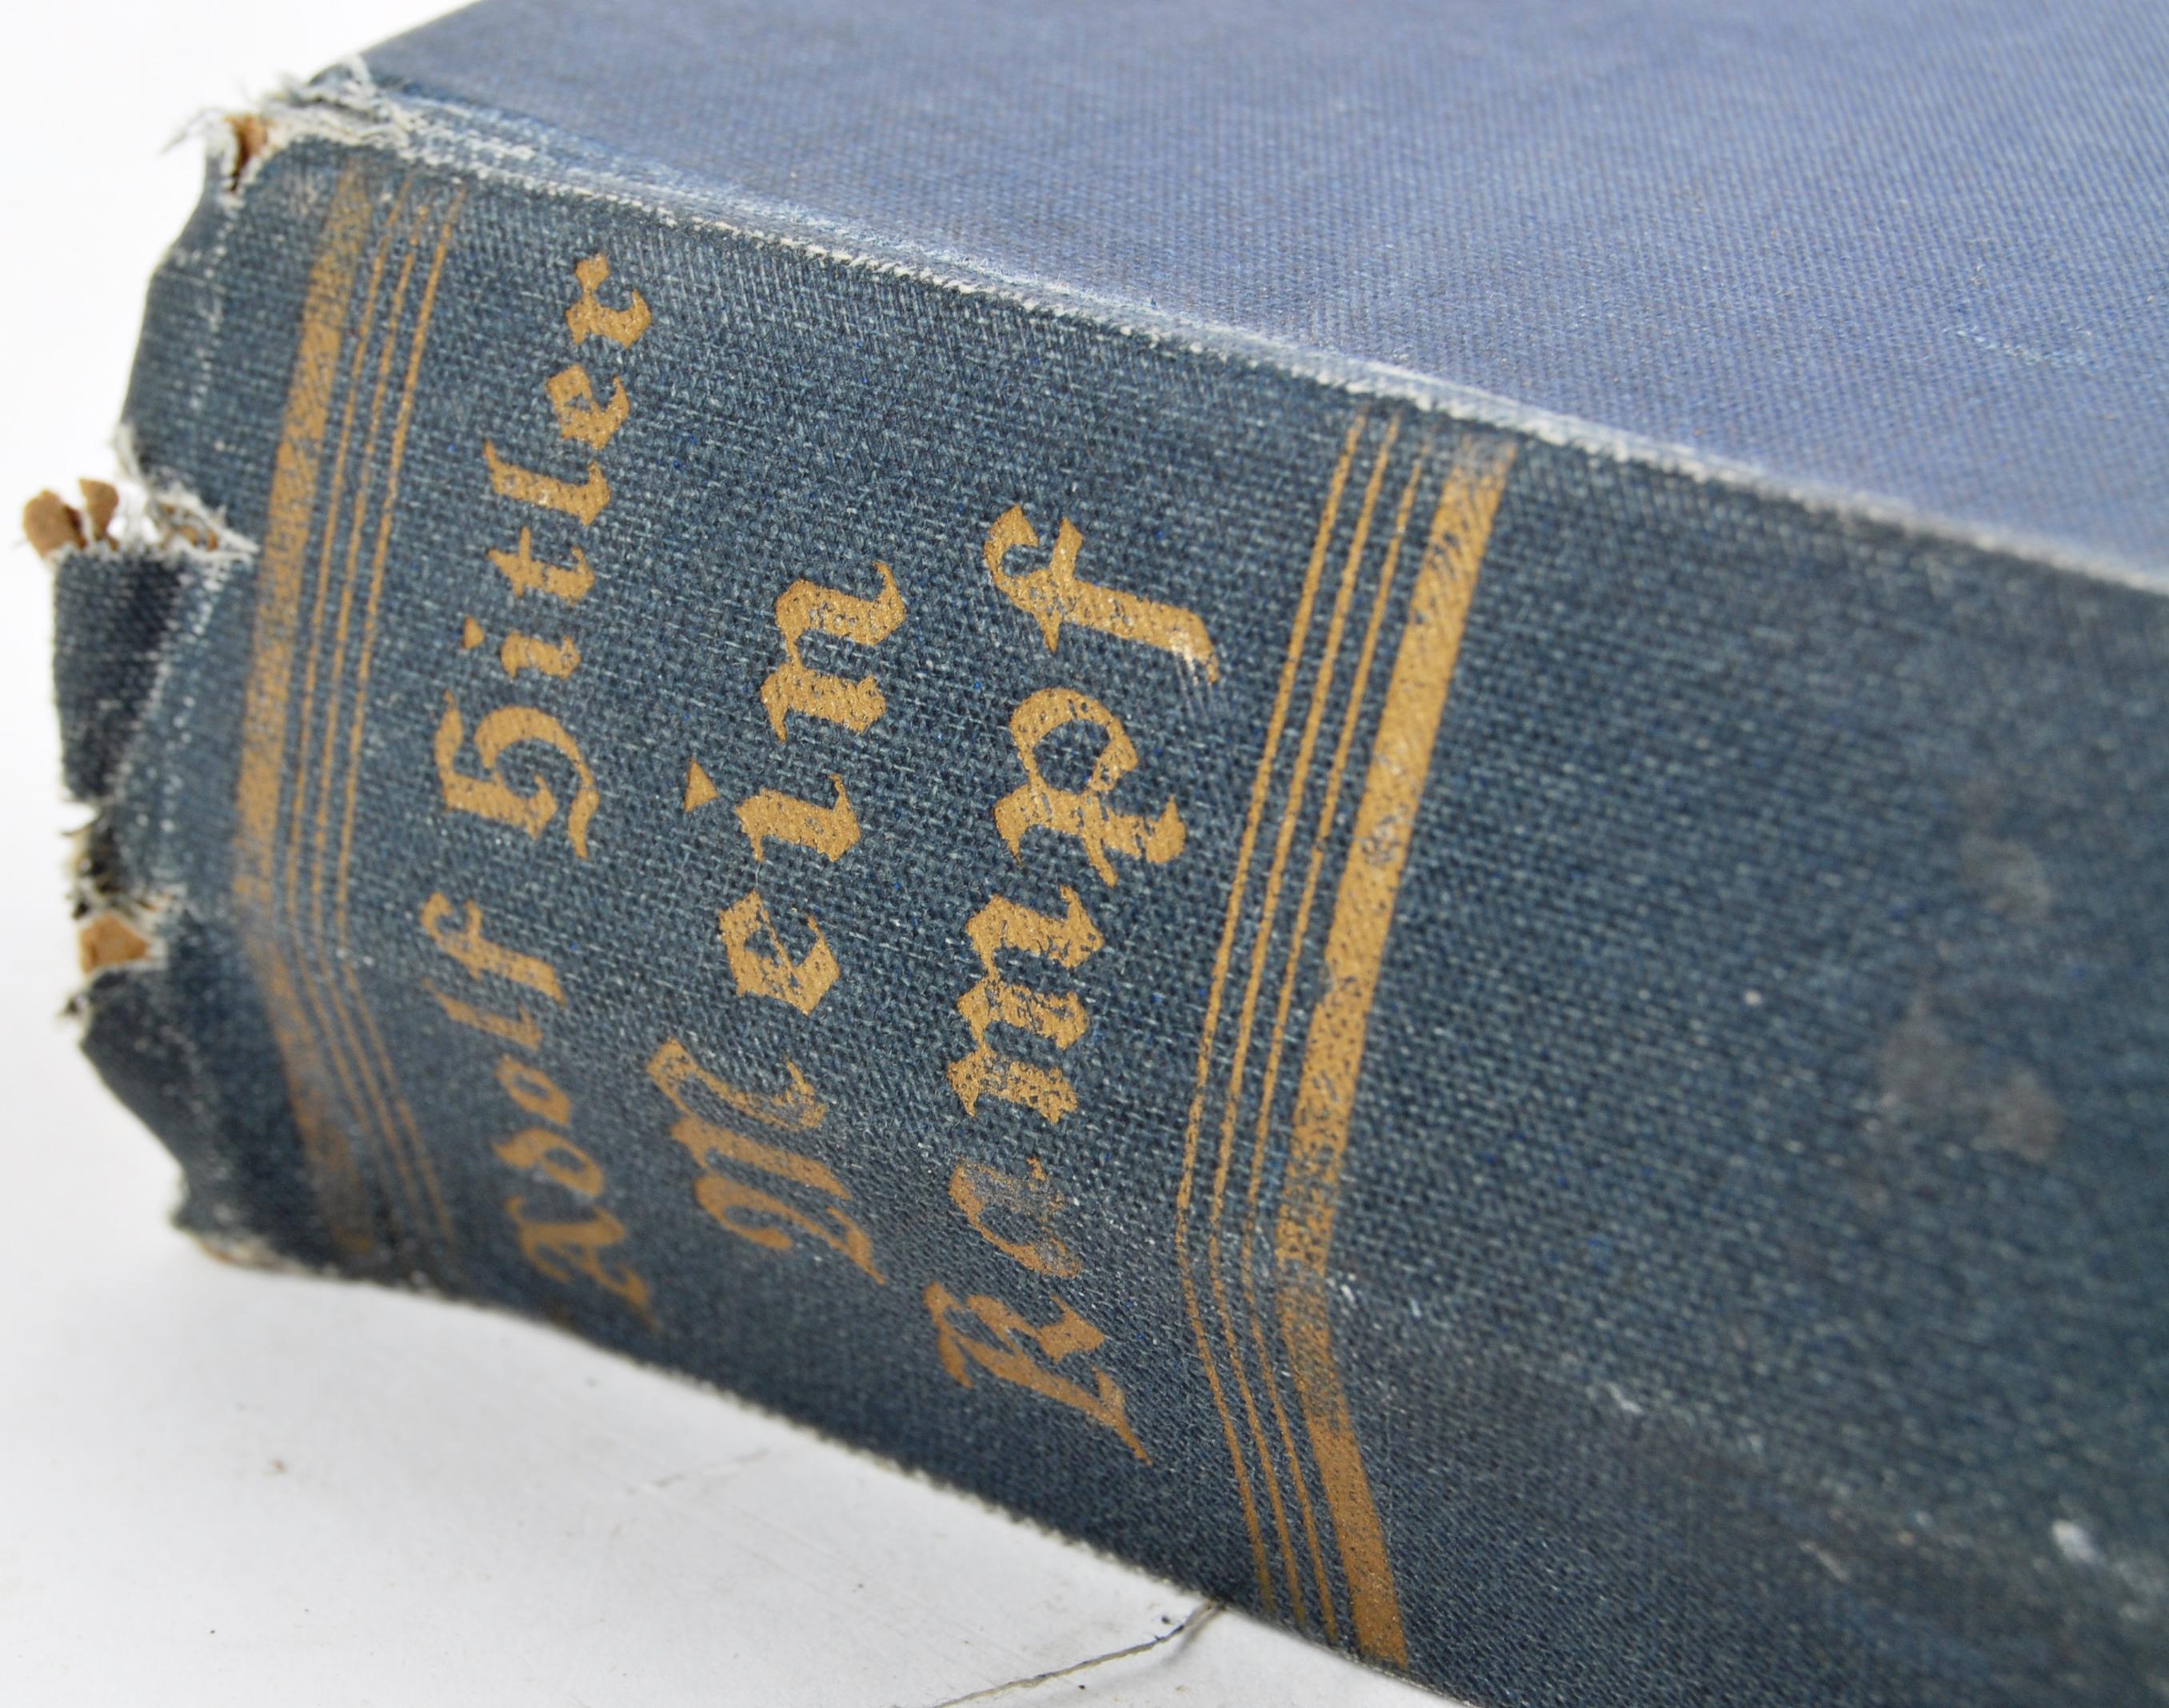 ADOLF HITLER - MEIN KAMPF - 1ST ENGLISH EDITION 1939 - Image 8 of 9